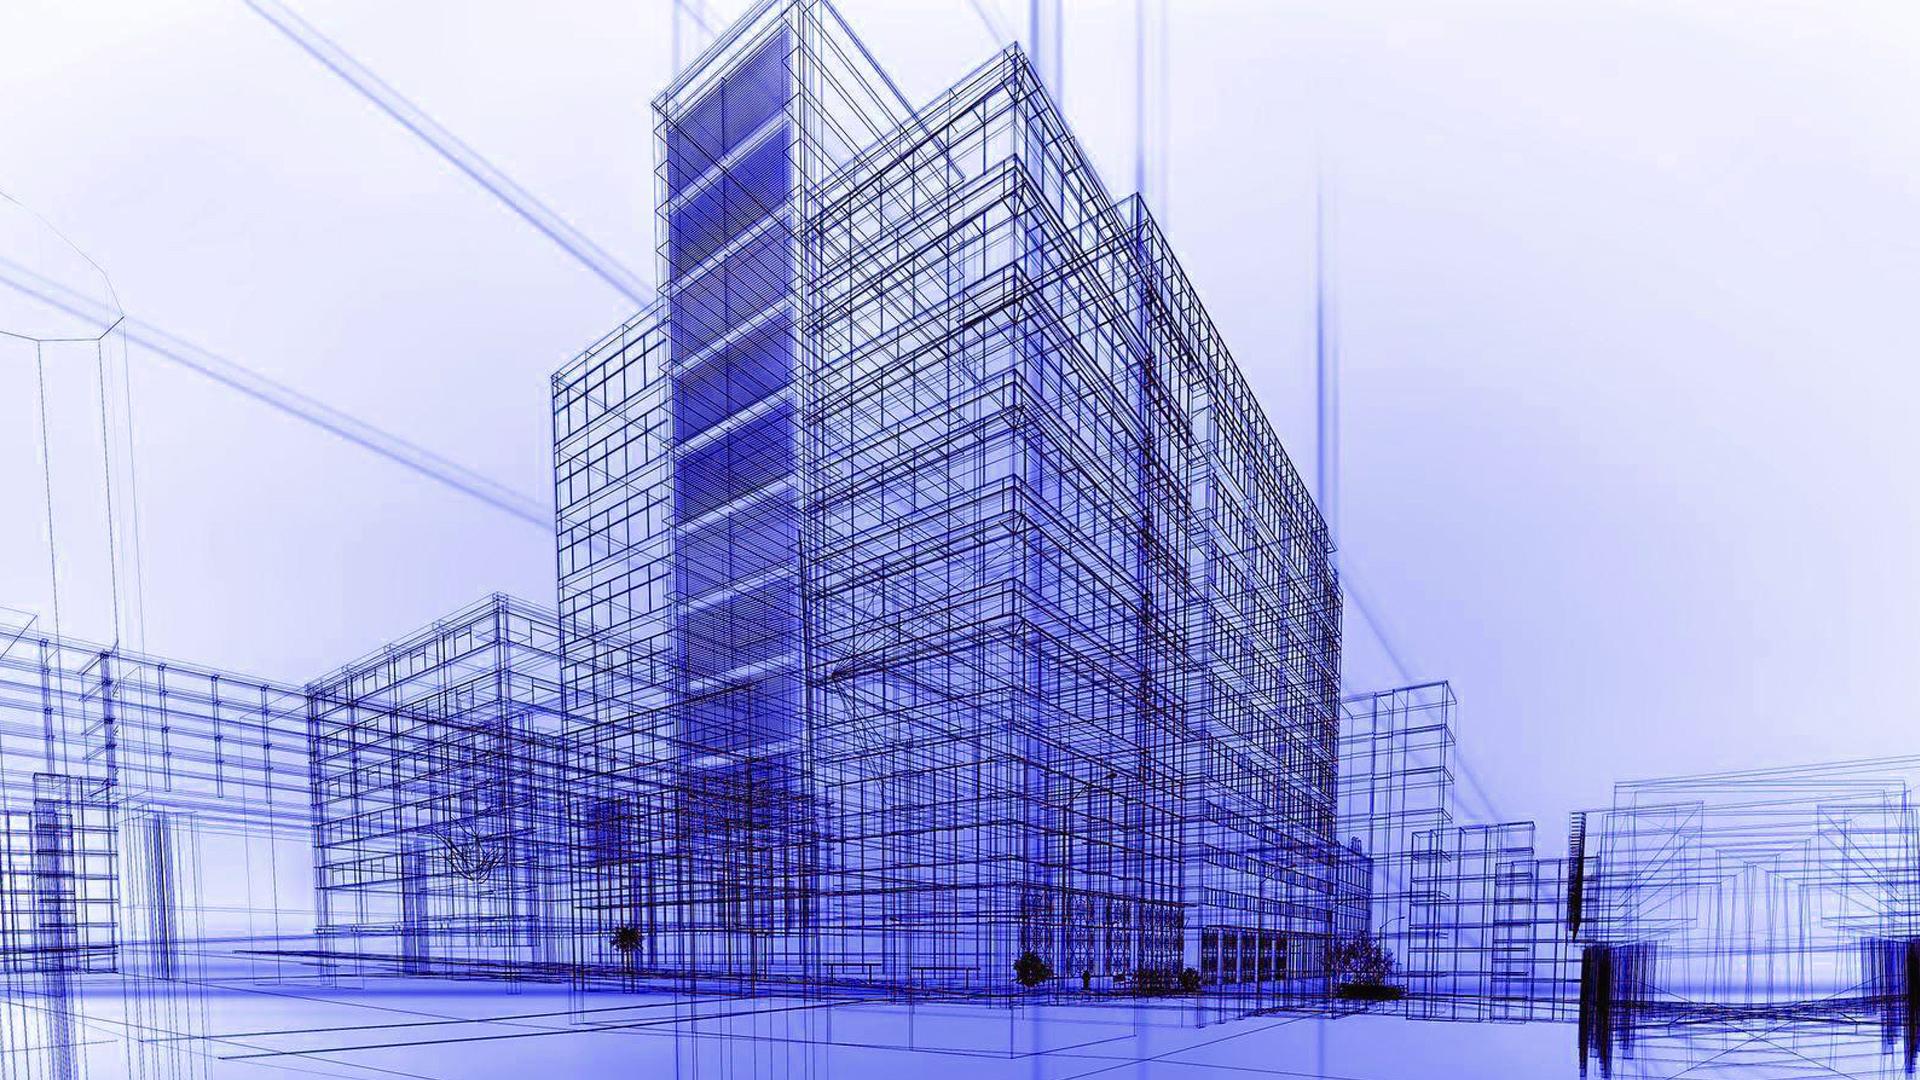 civil engineering desktop wallpaper in hd 1080p � 08 of 10